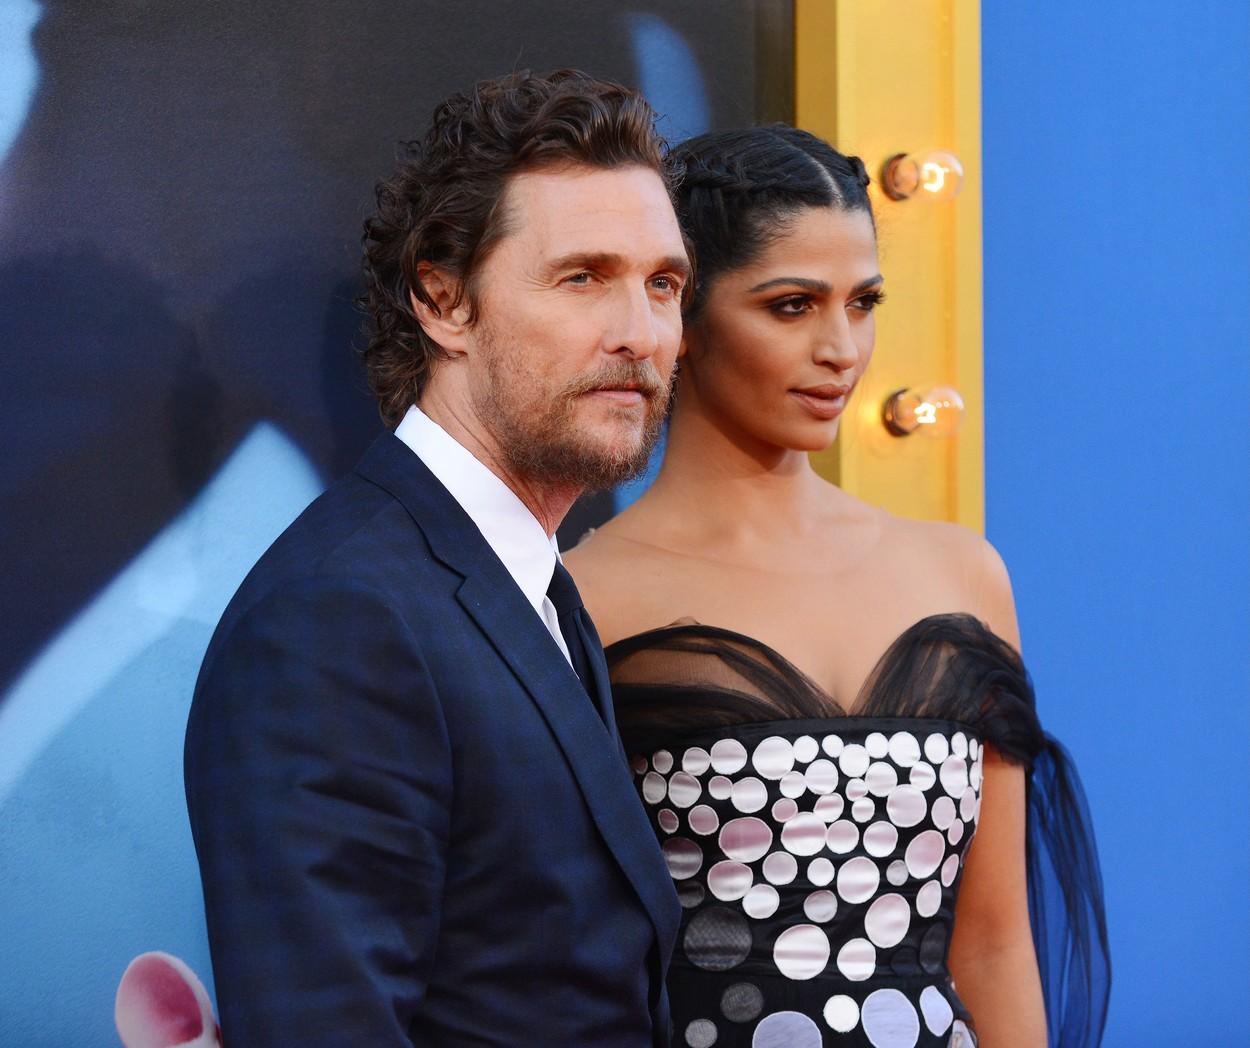 Matthew McConaughey și Camila Alves McConaughey la premiera filmului Sing